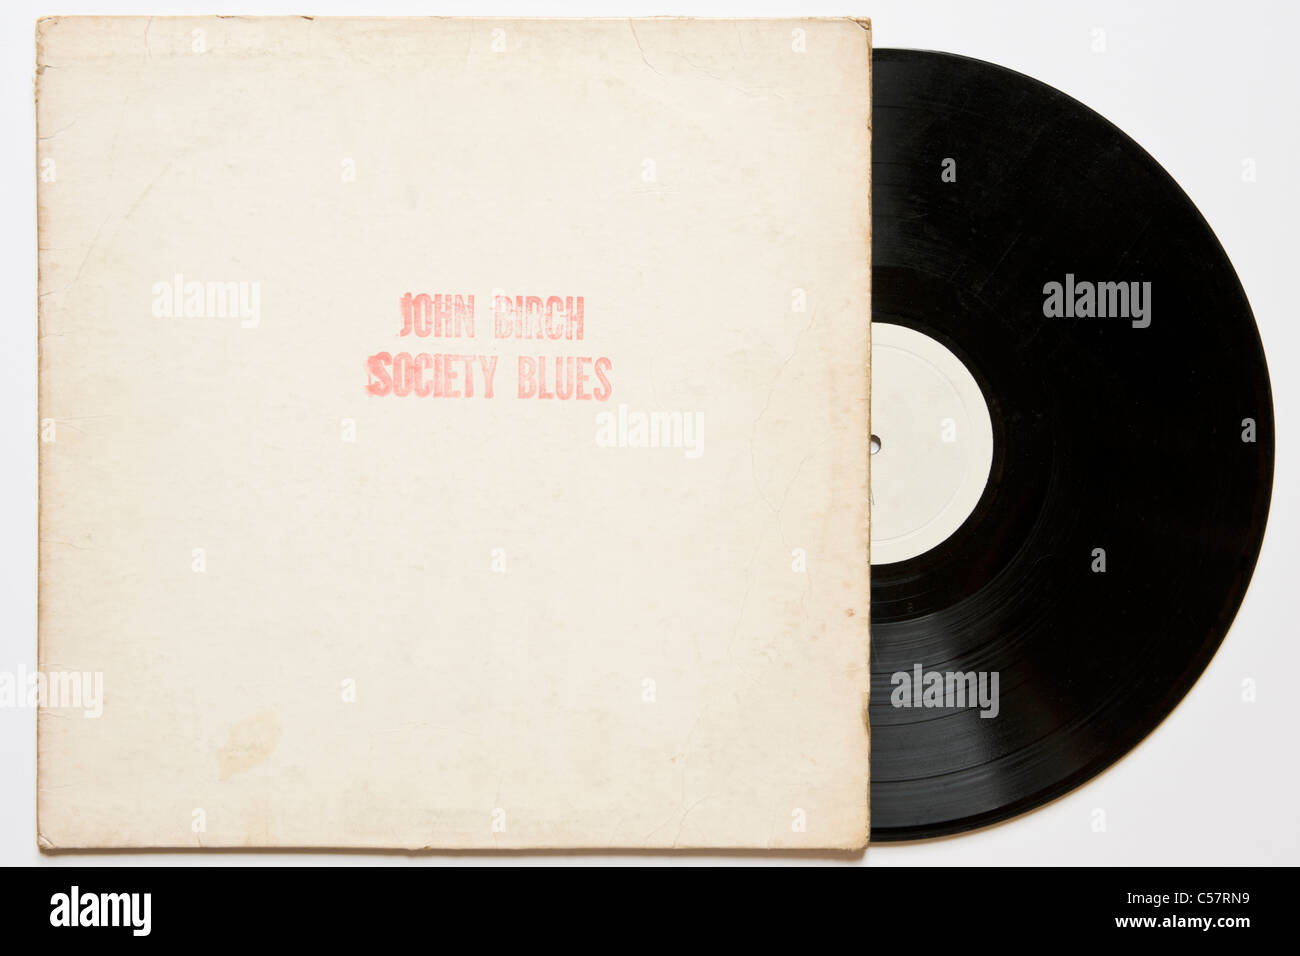 Original bootleg recording of John Birch Society Blues Bob Dylan 1961-64 released 1970 on black vinyl concert & Stock Photo